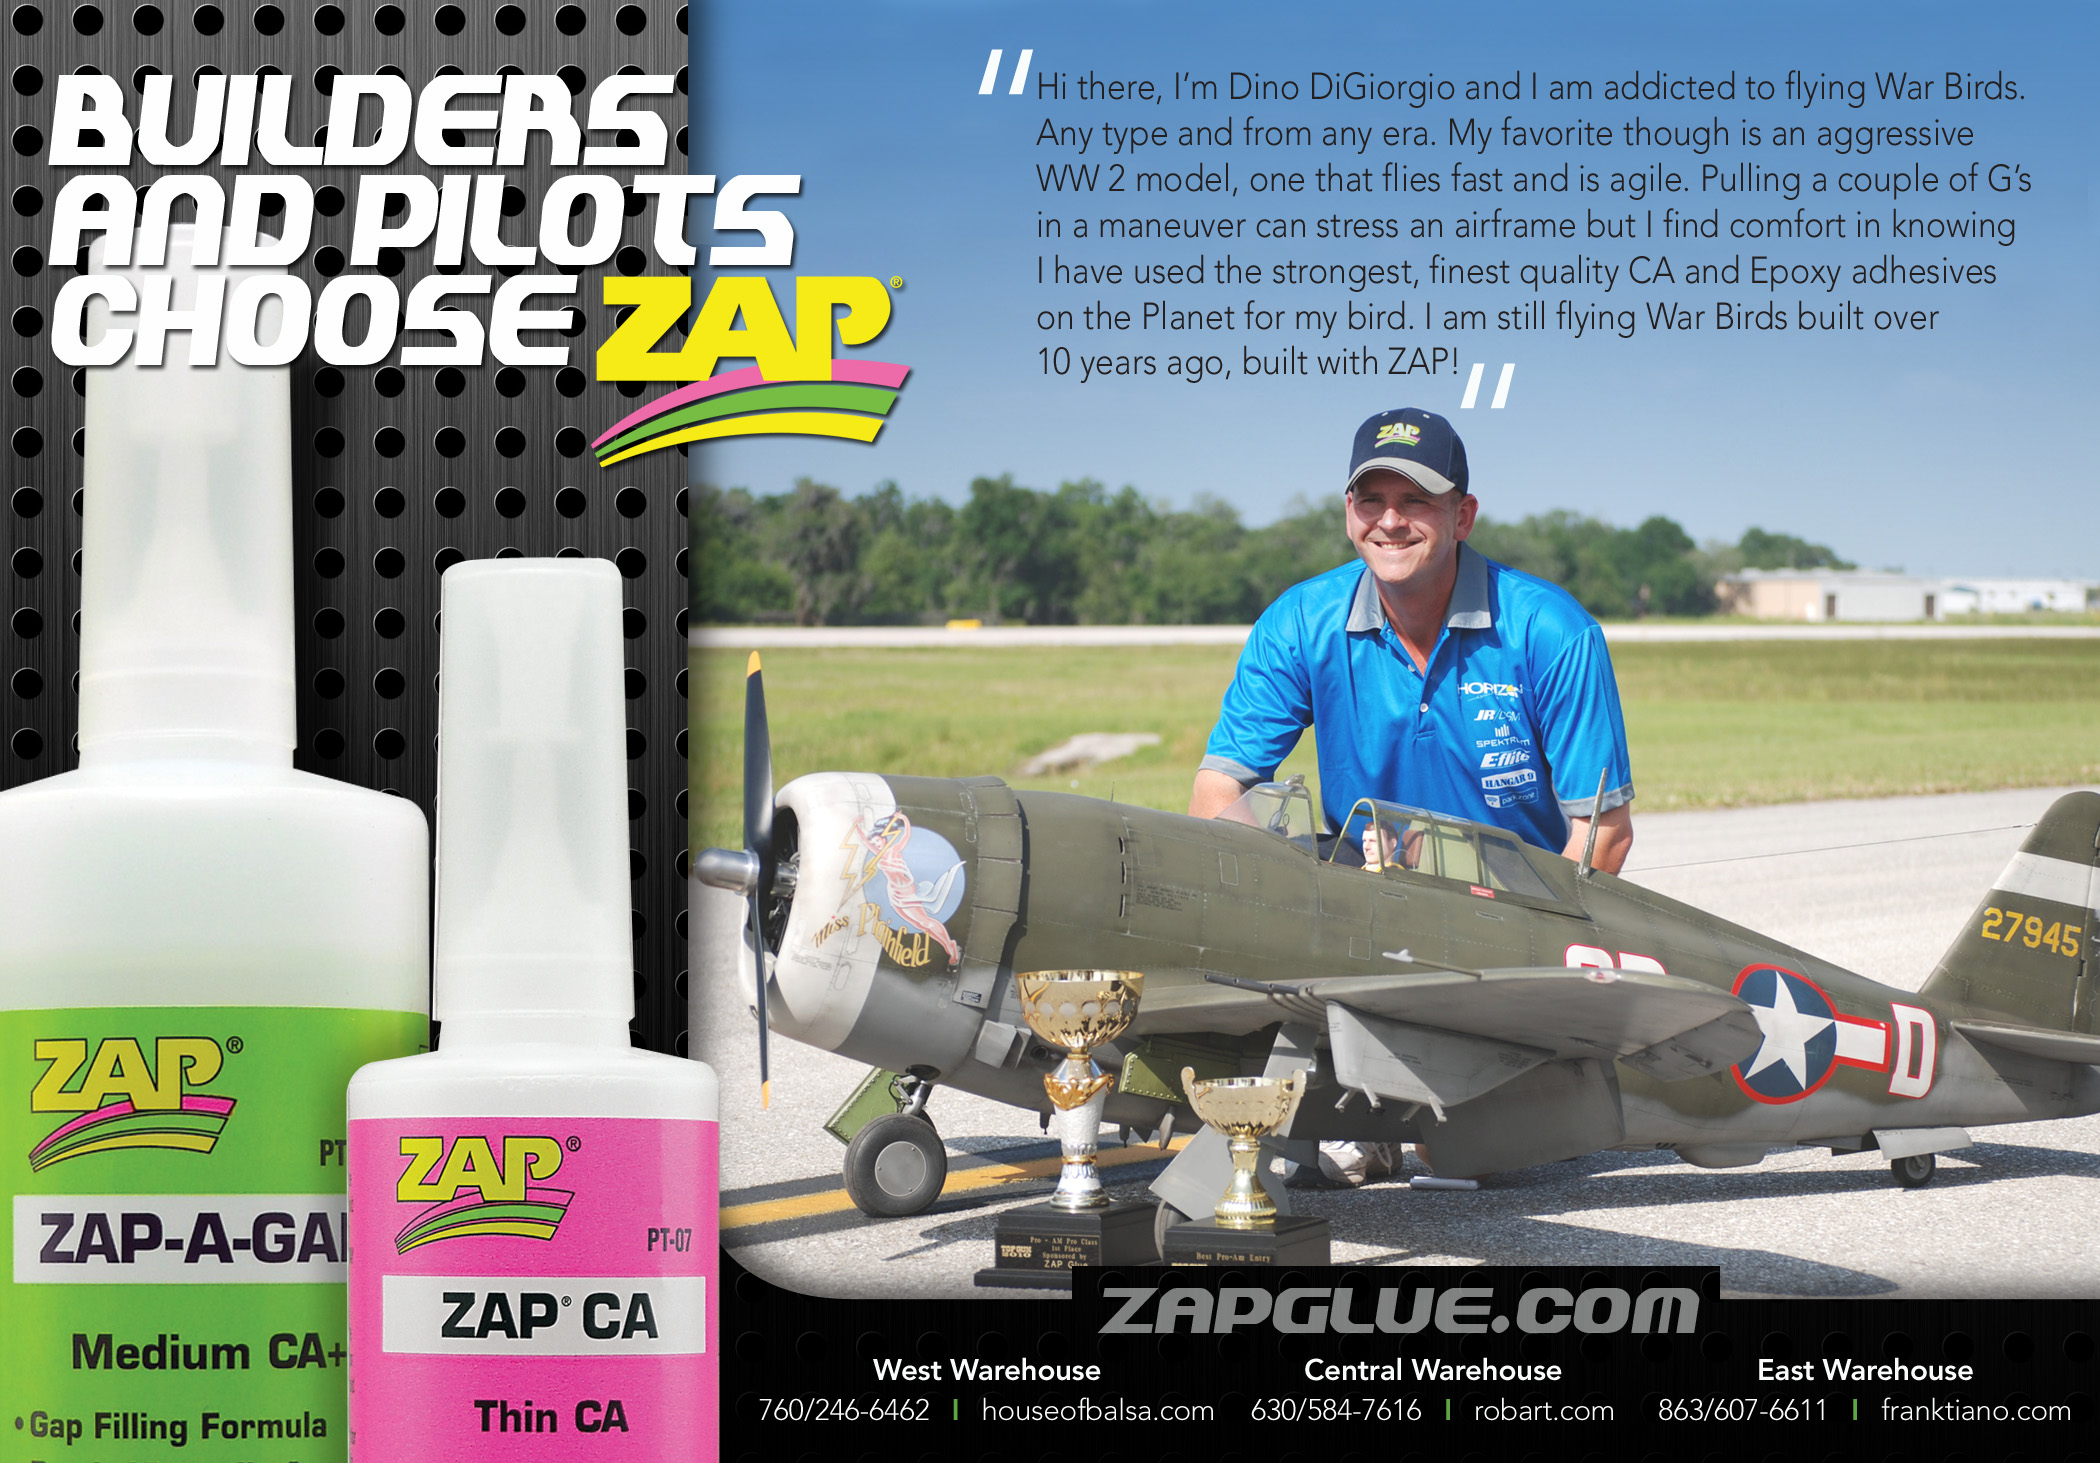 ZAP_Half_Page_Dino_Mag.jpg